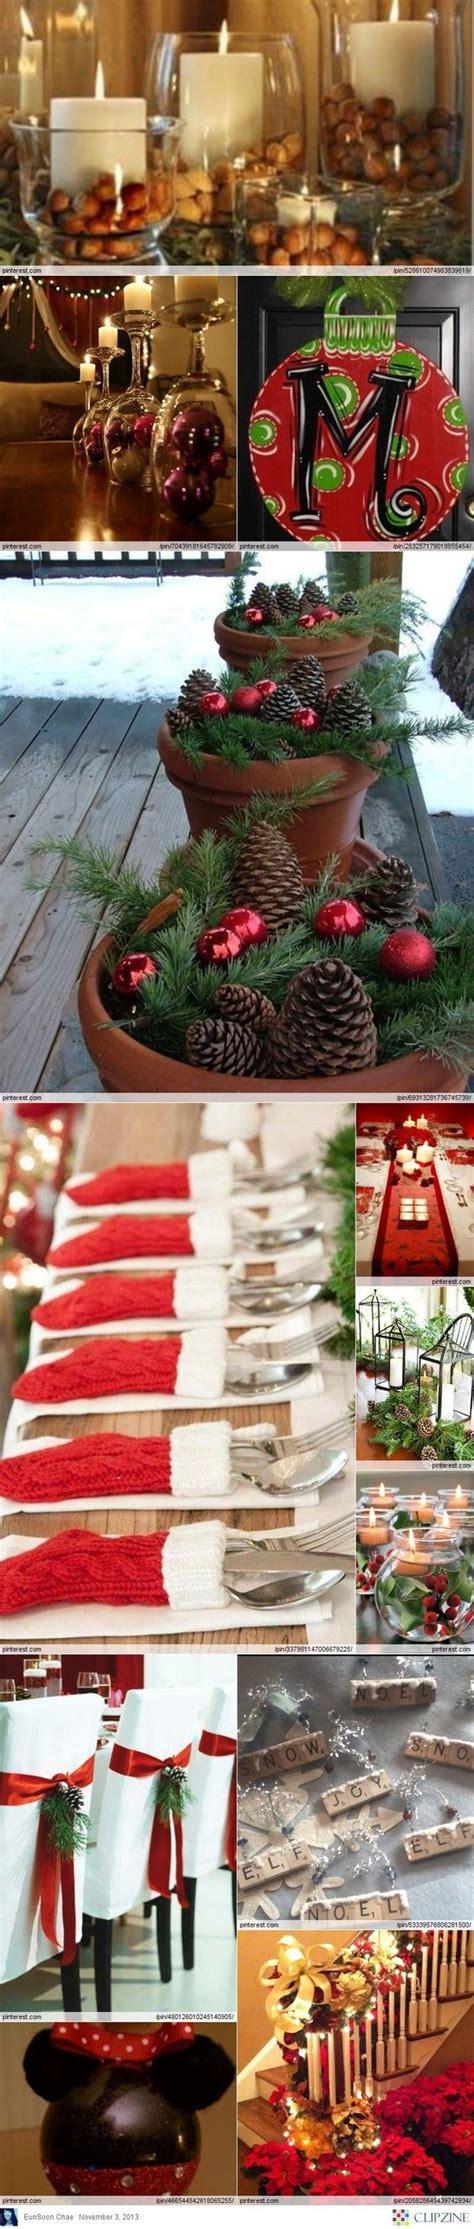 l post decoration ideas decorations the terra cotta pots great